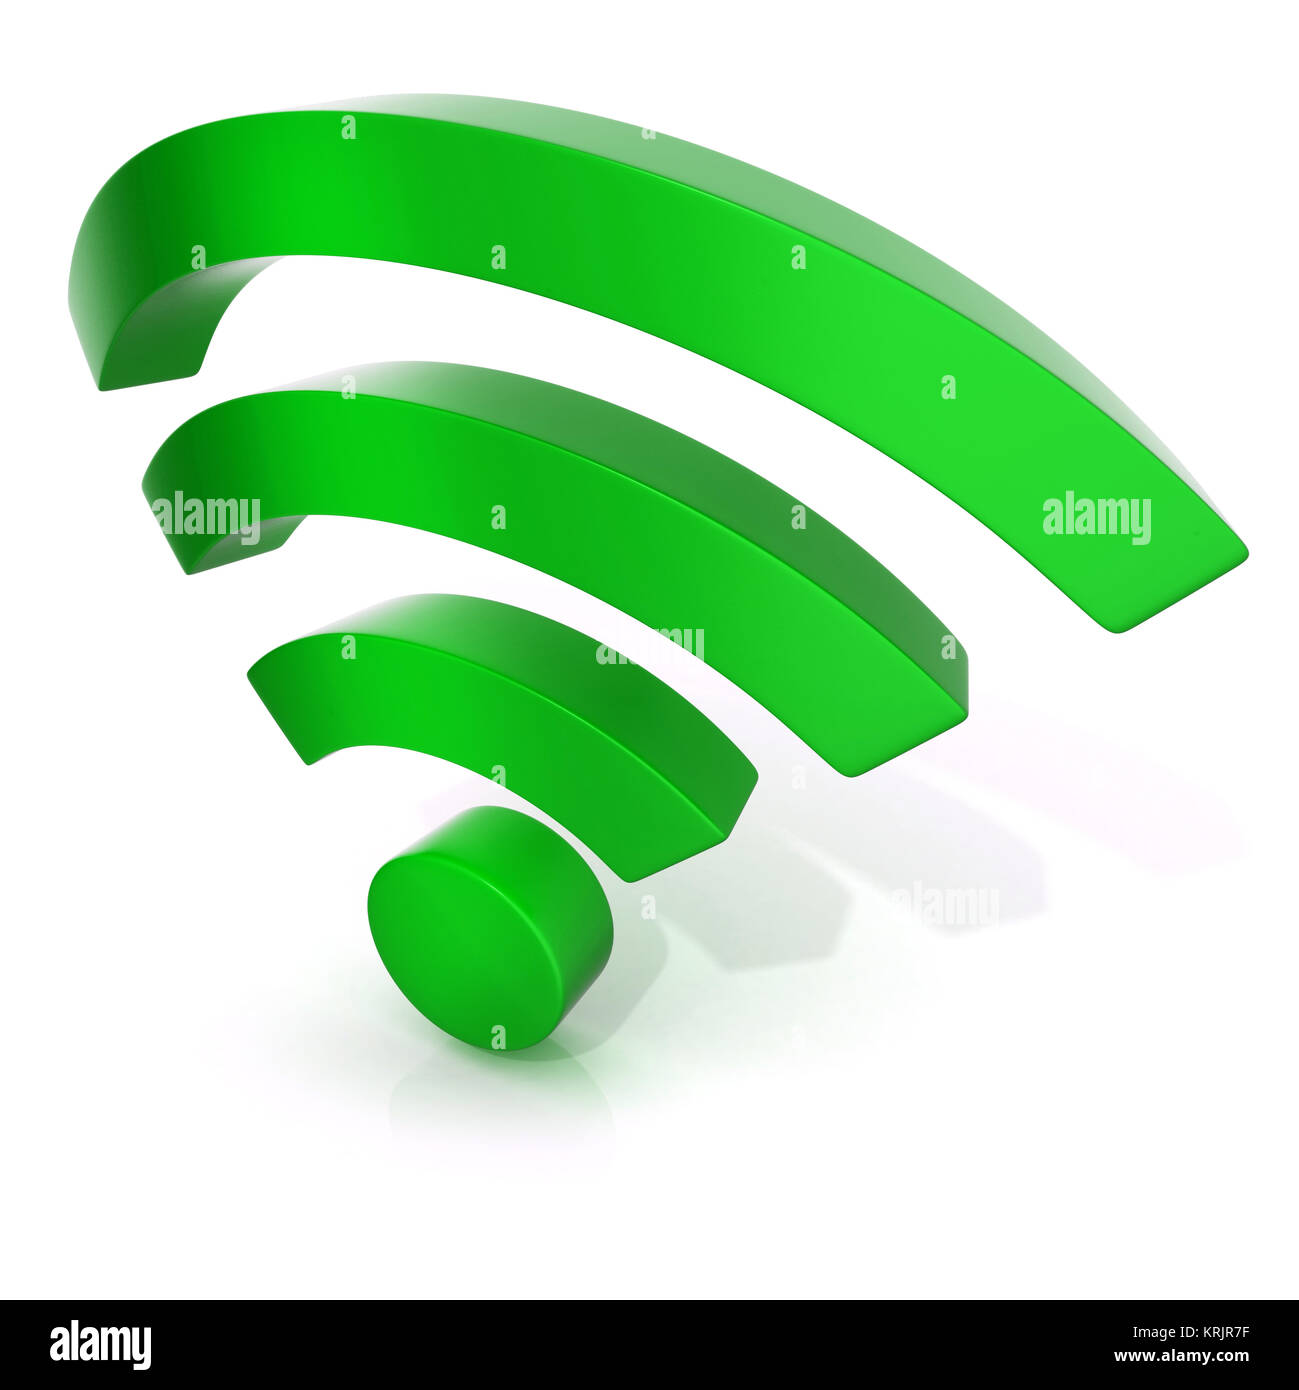 Wireless Network Symbol 3d Stock Photo 169443779 Alamy